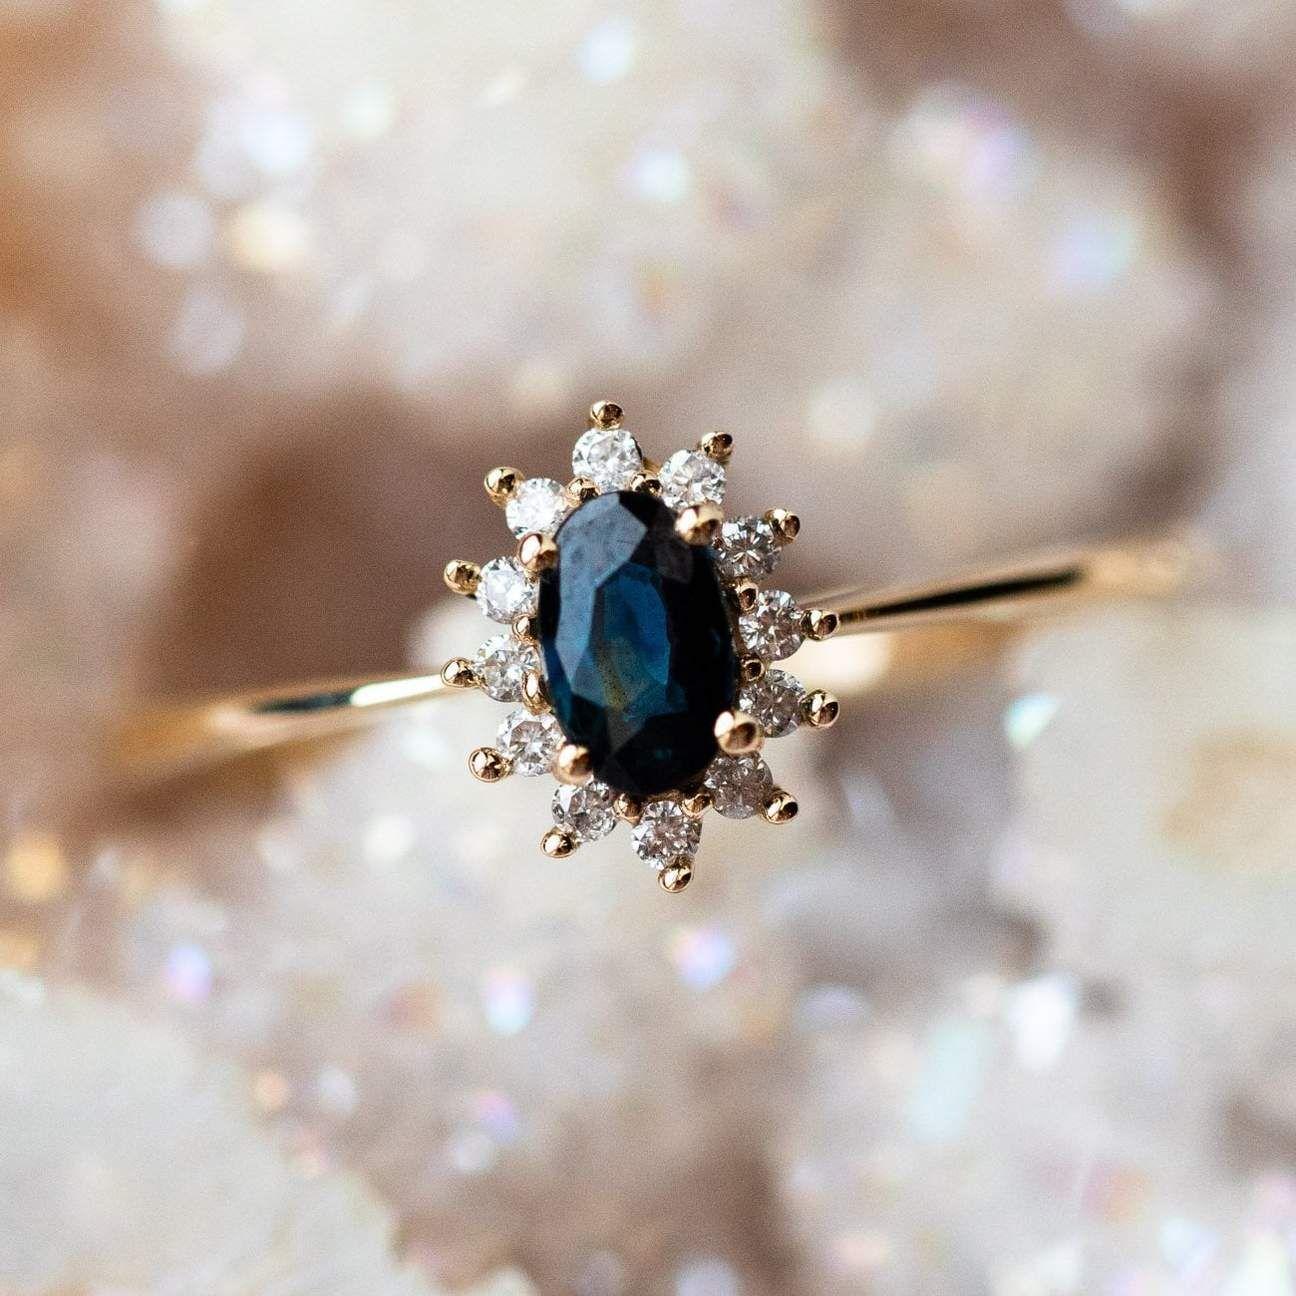 14kt Teal Sapphire & Diamond Fleurette Ring Engagement